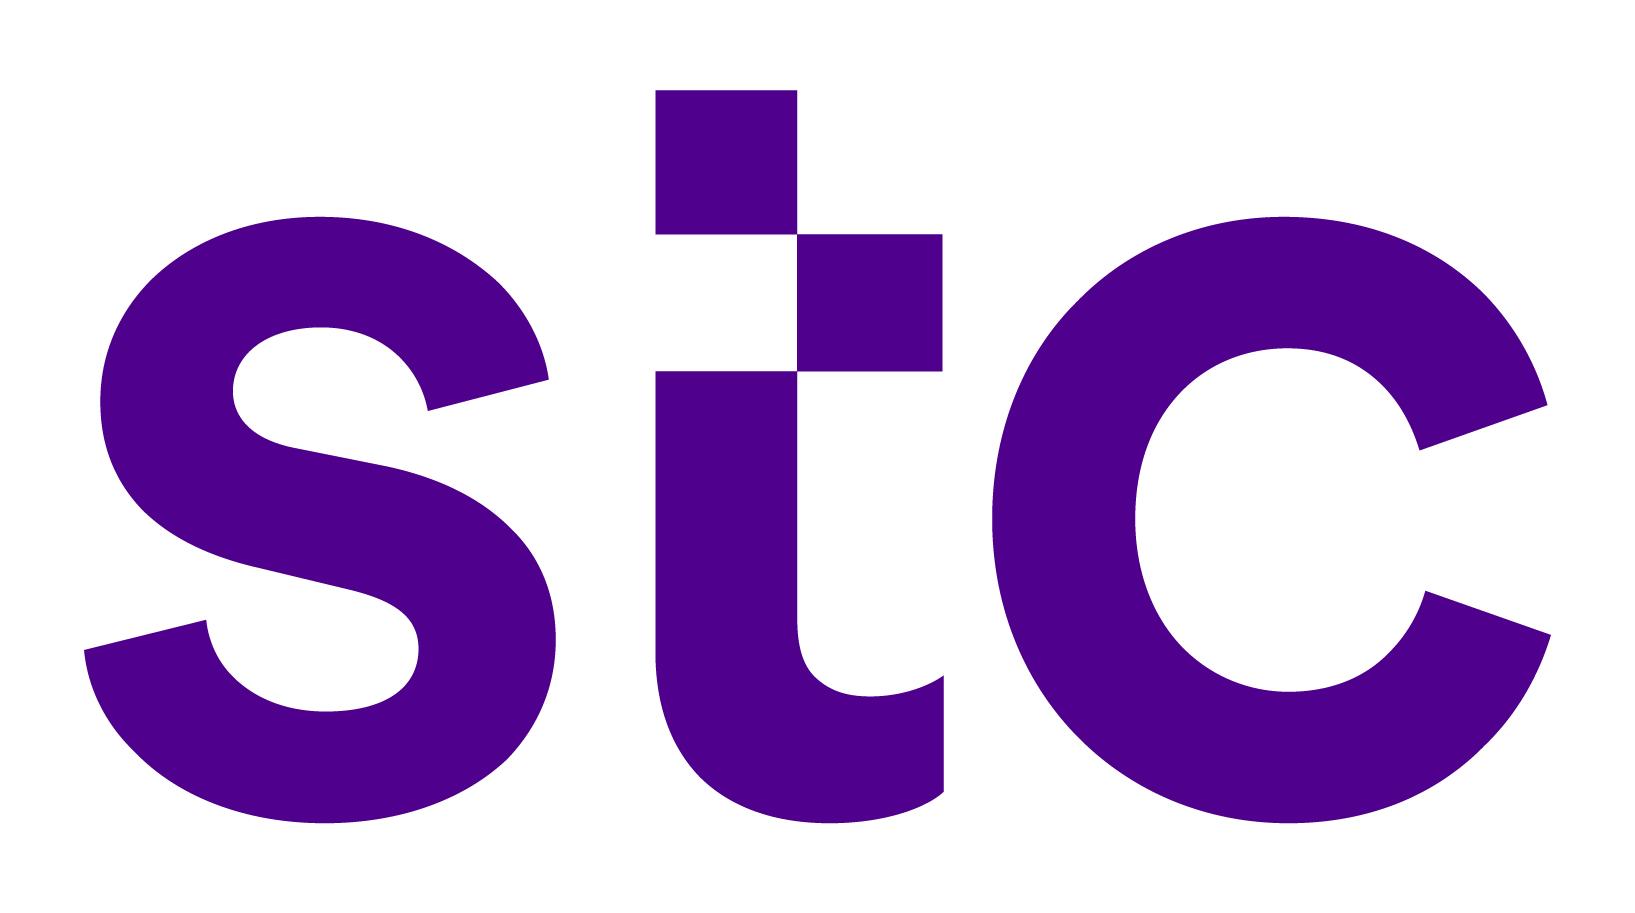 02-stc_logo.png